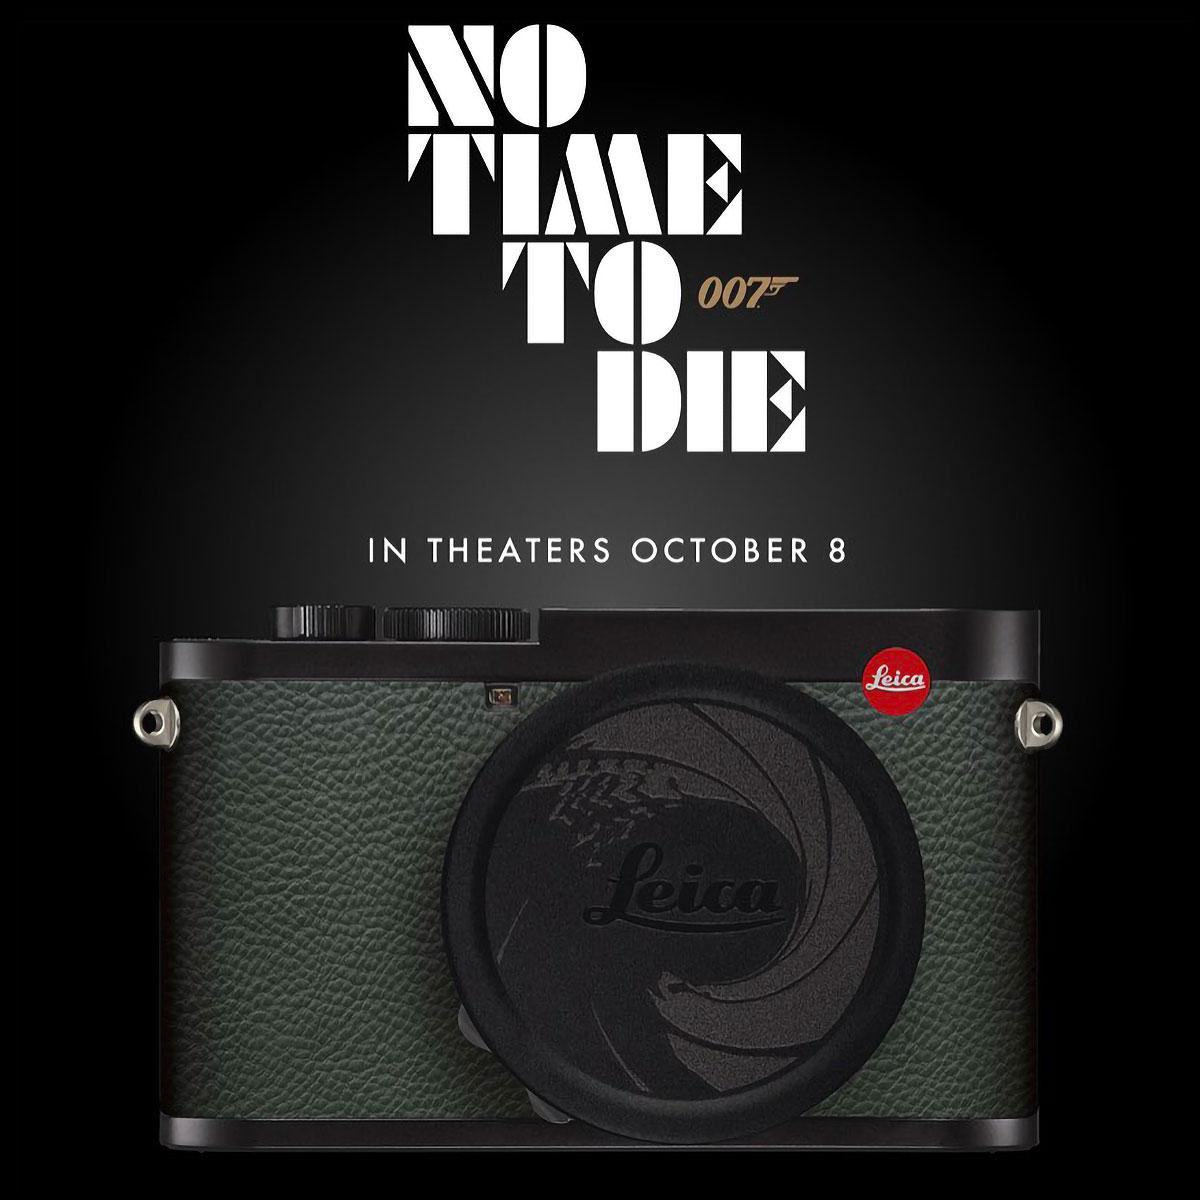 Leica Q2 James Bond 007 Limited Edition Camera